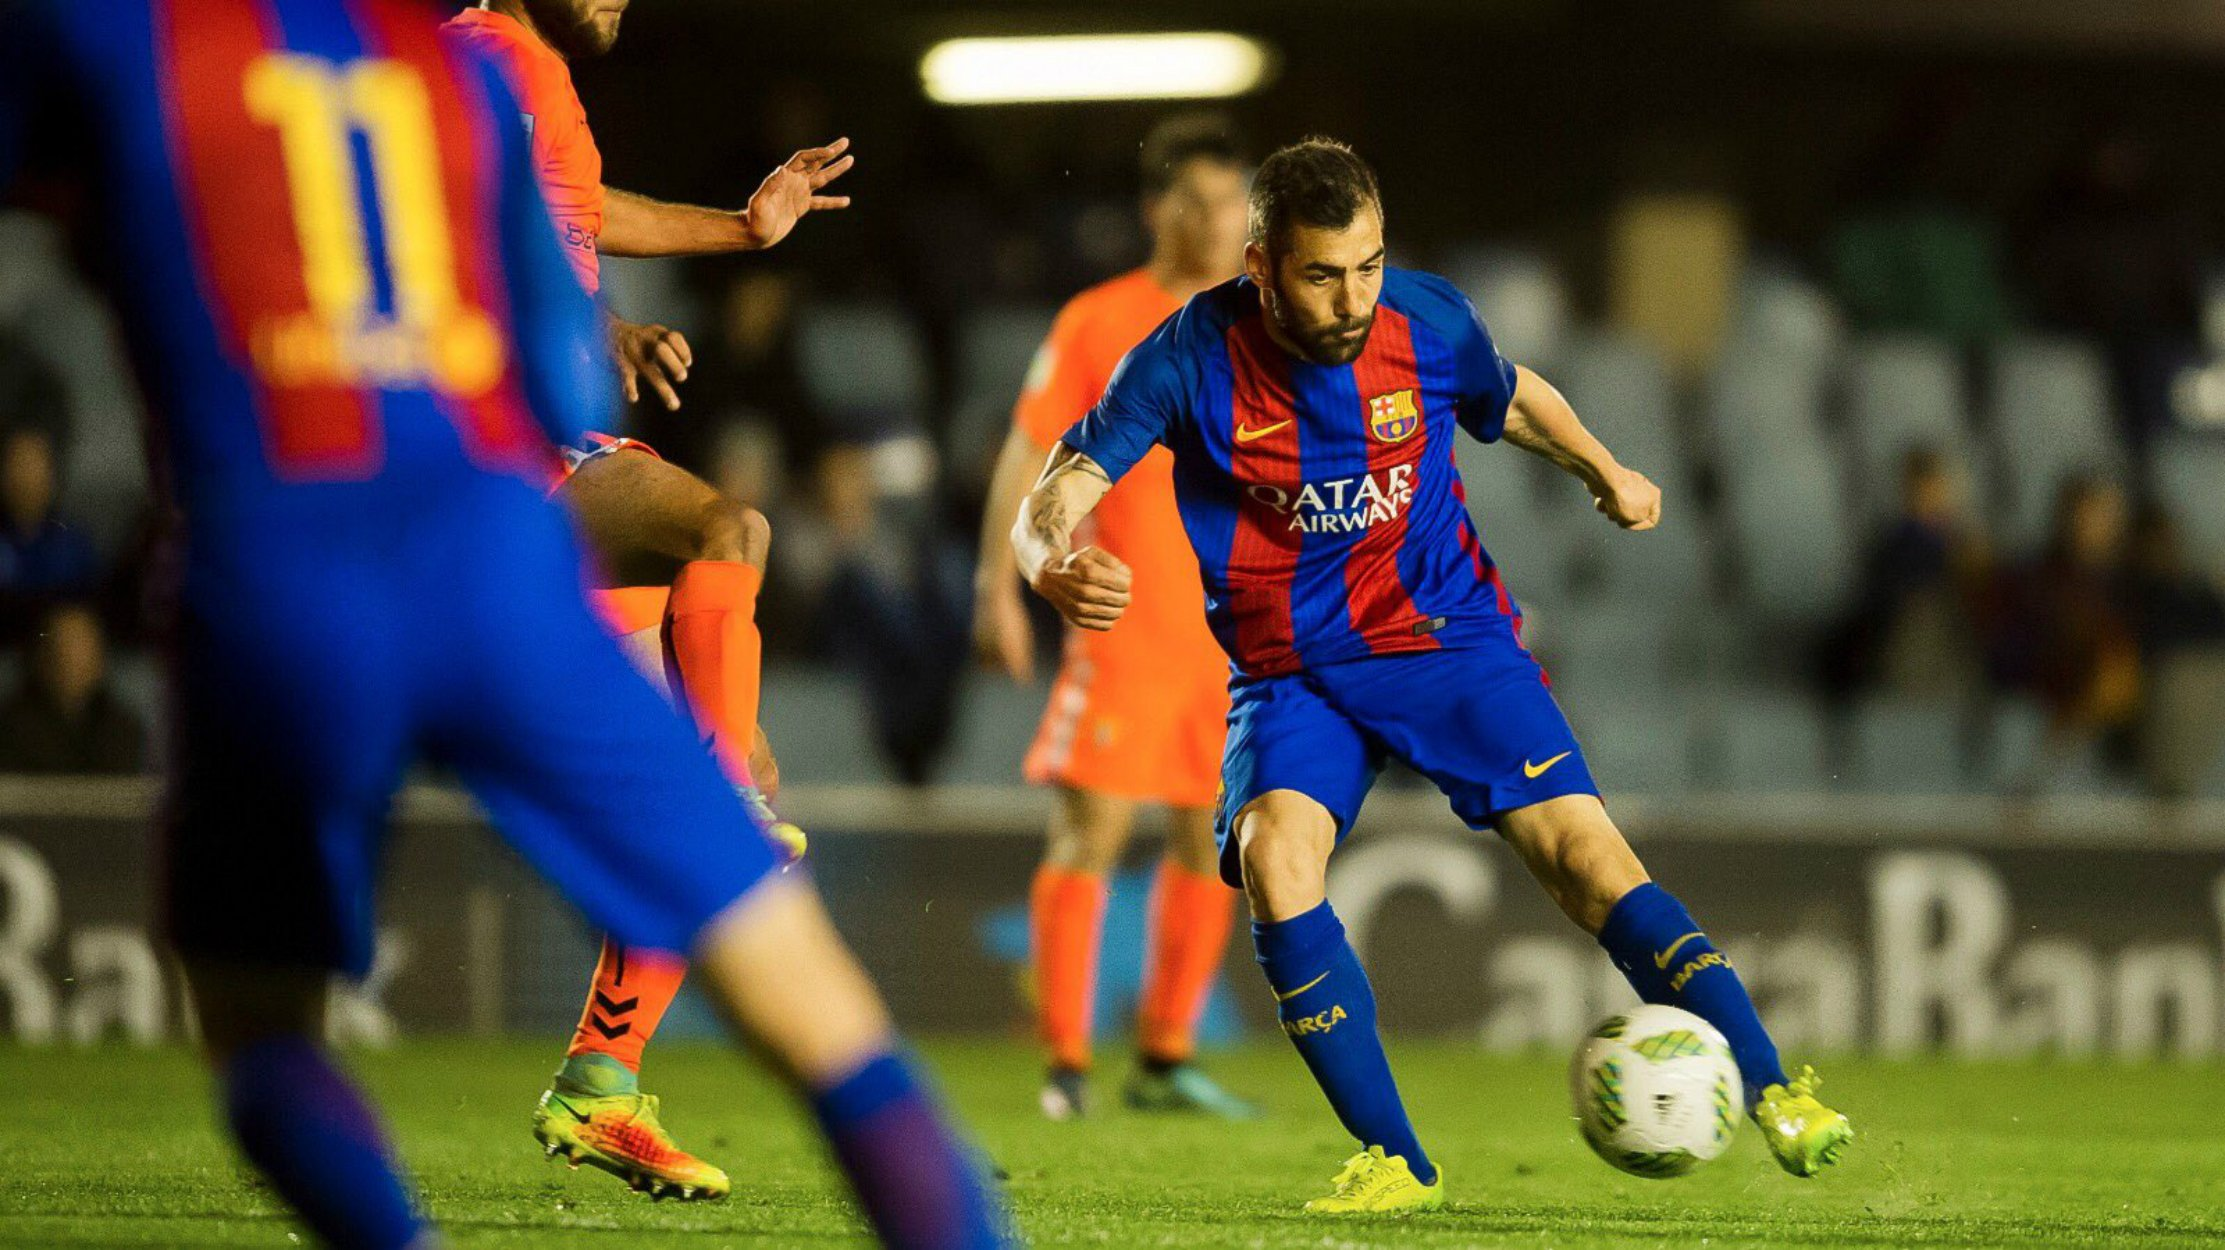 Alberto Perea Barça filial   EFE